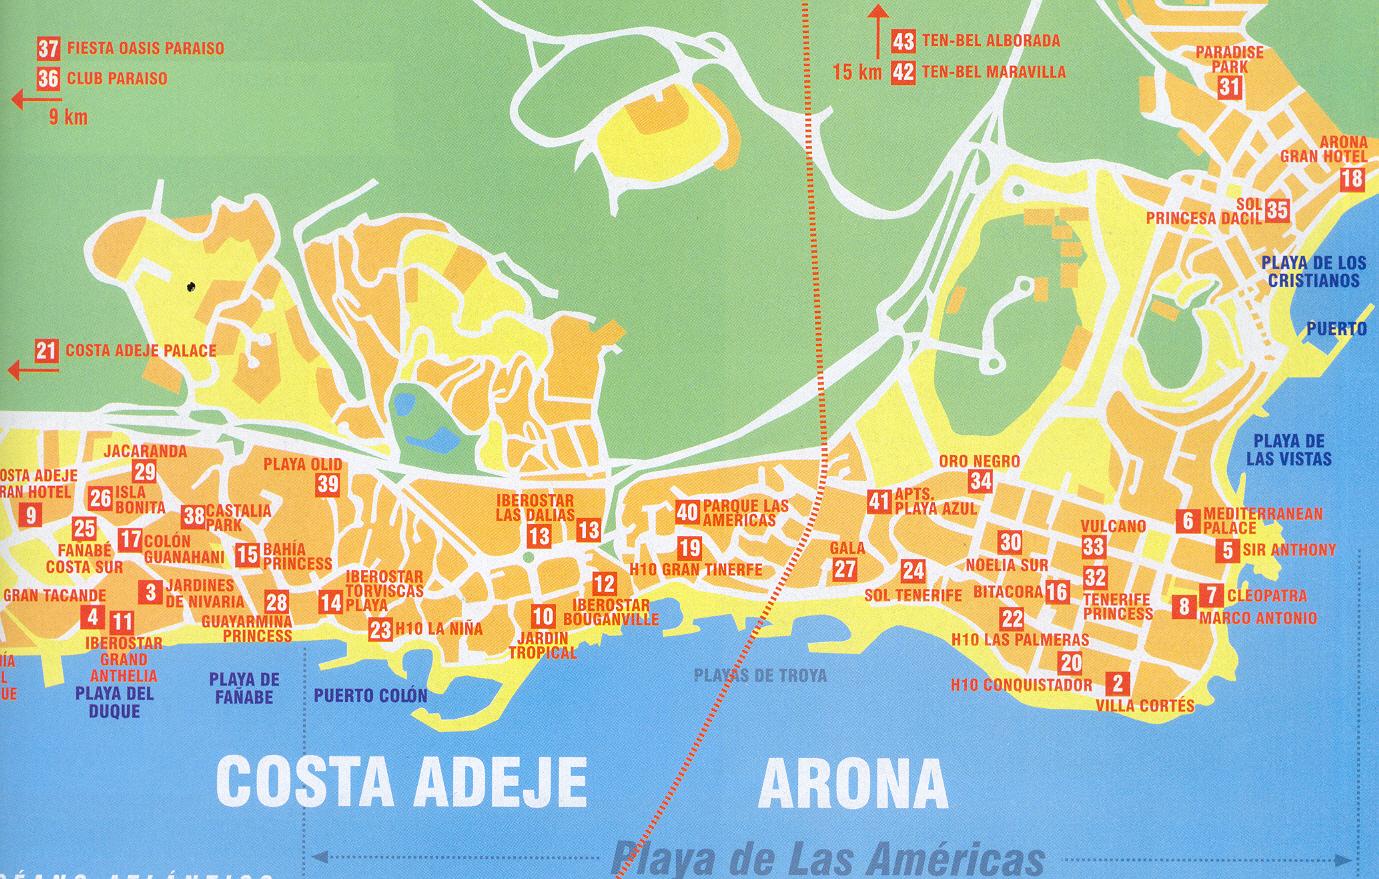 Playa paraiso tenerife map